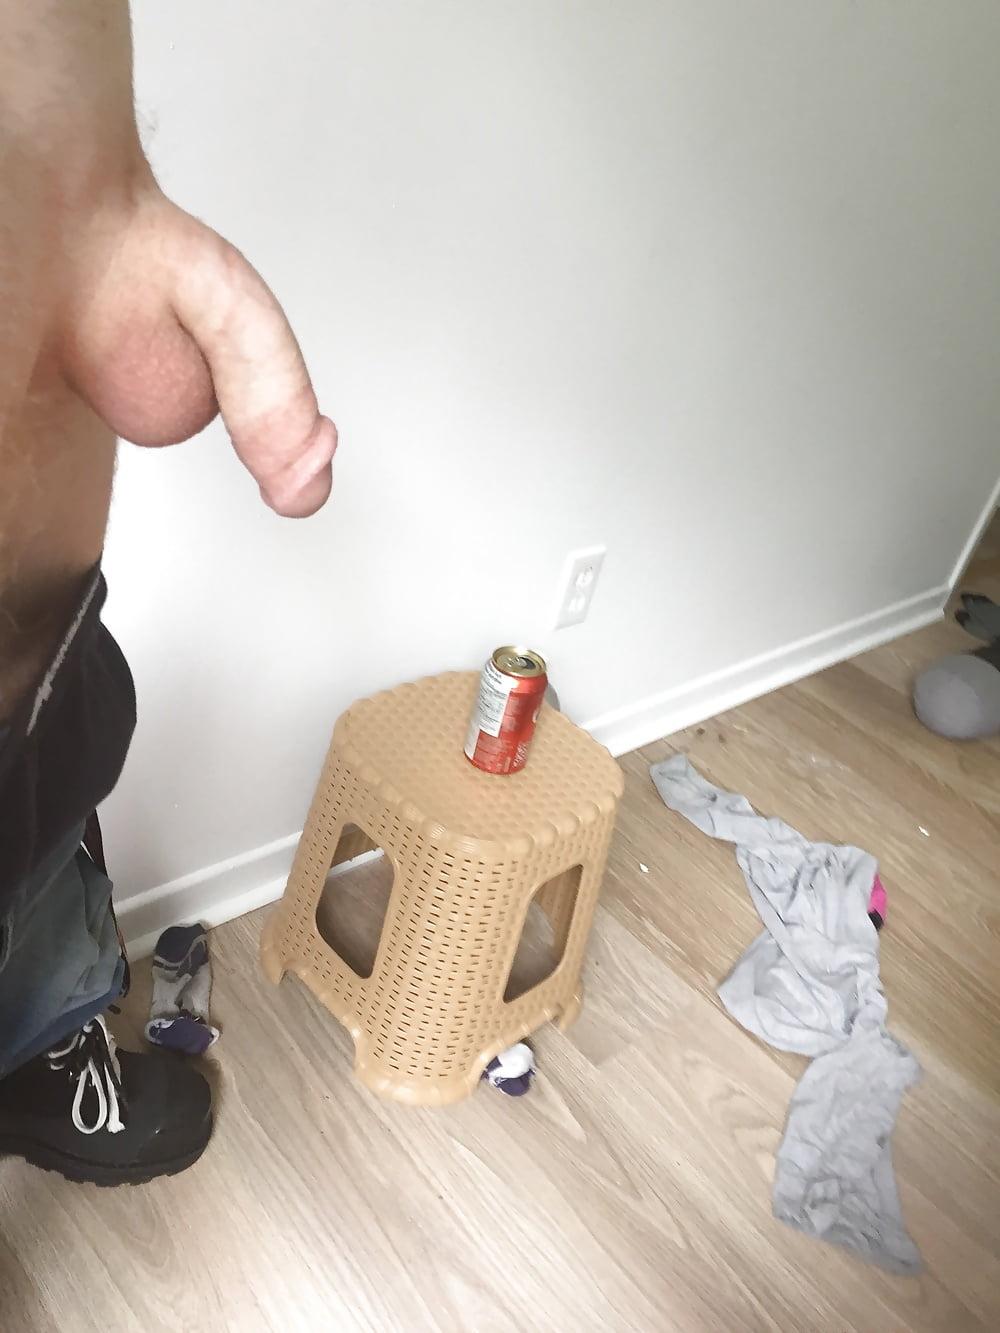 Large dick porn pics